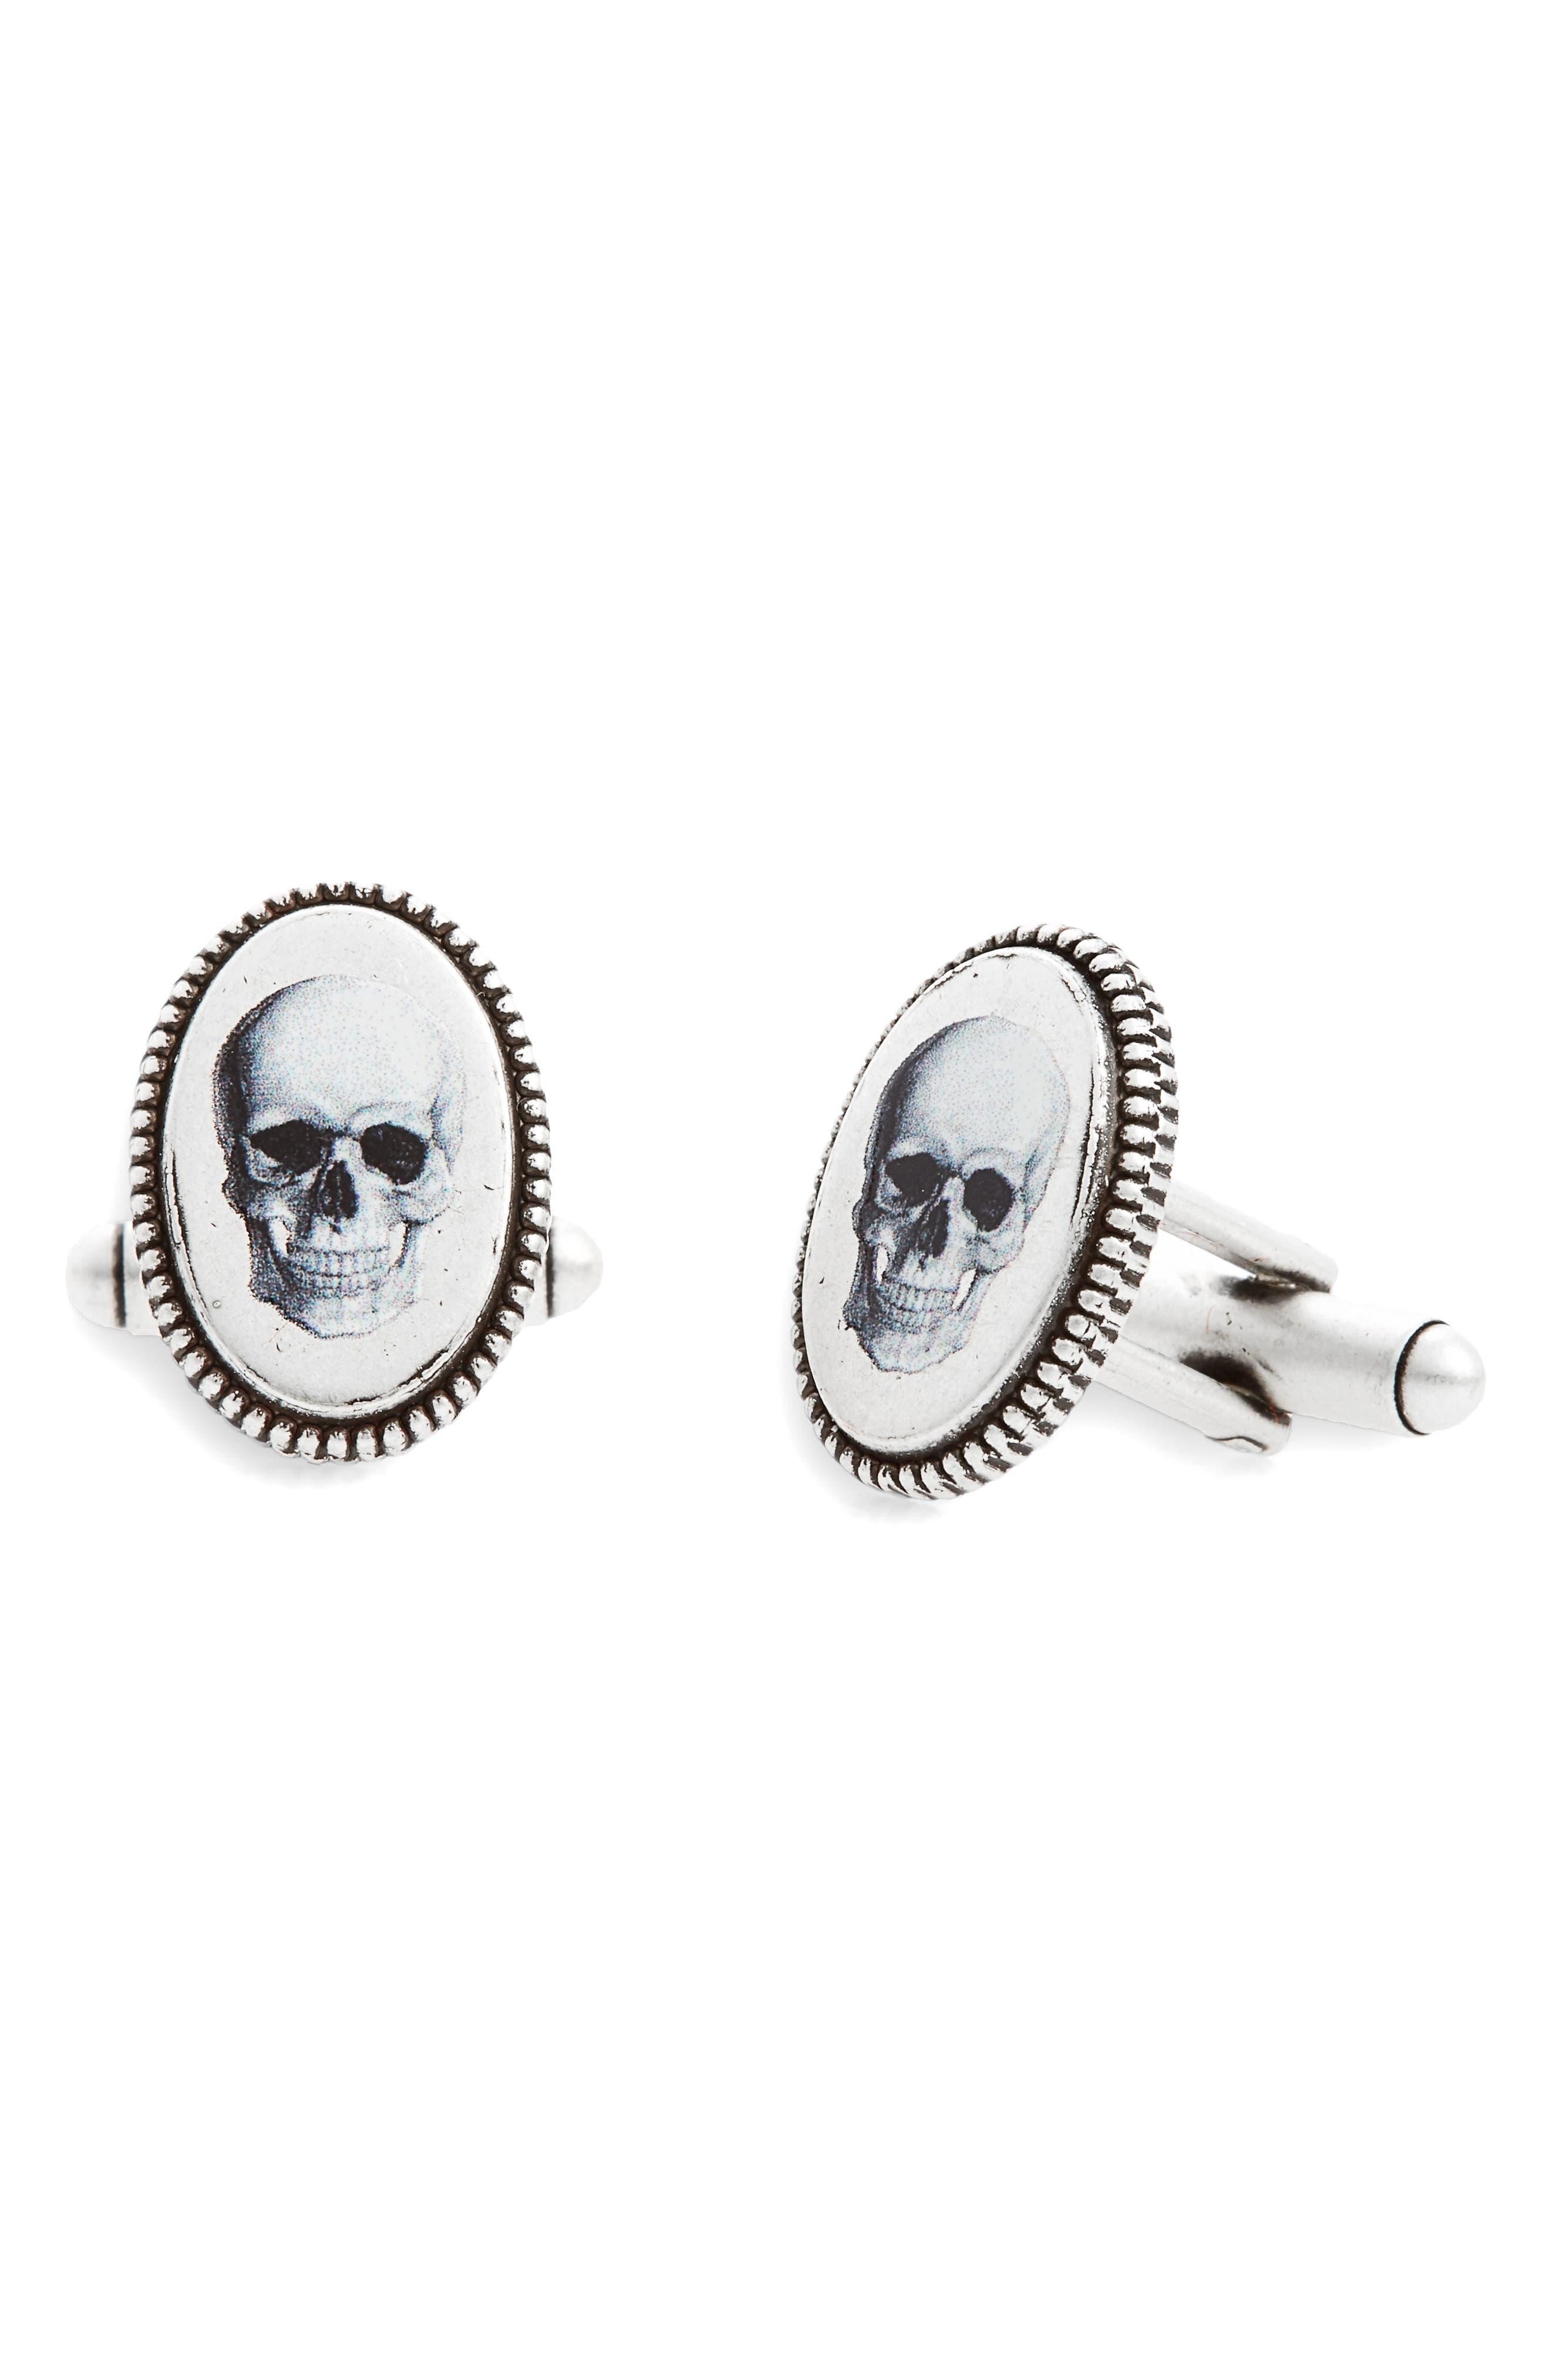 Skull Cuff Links,                         Main,                         color, Silver